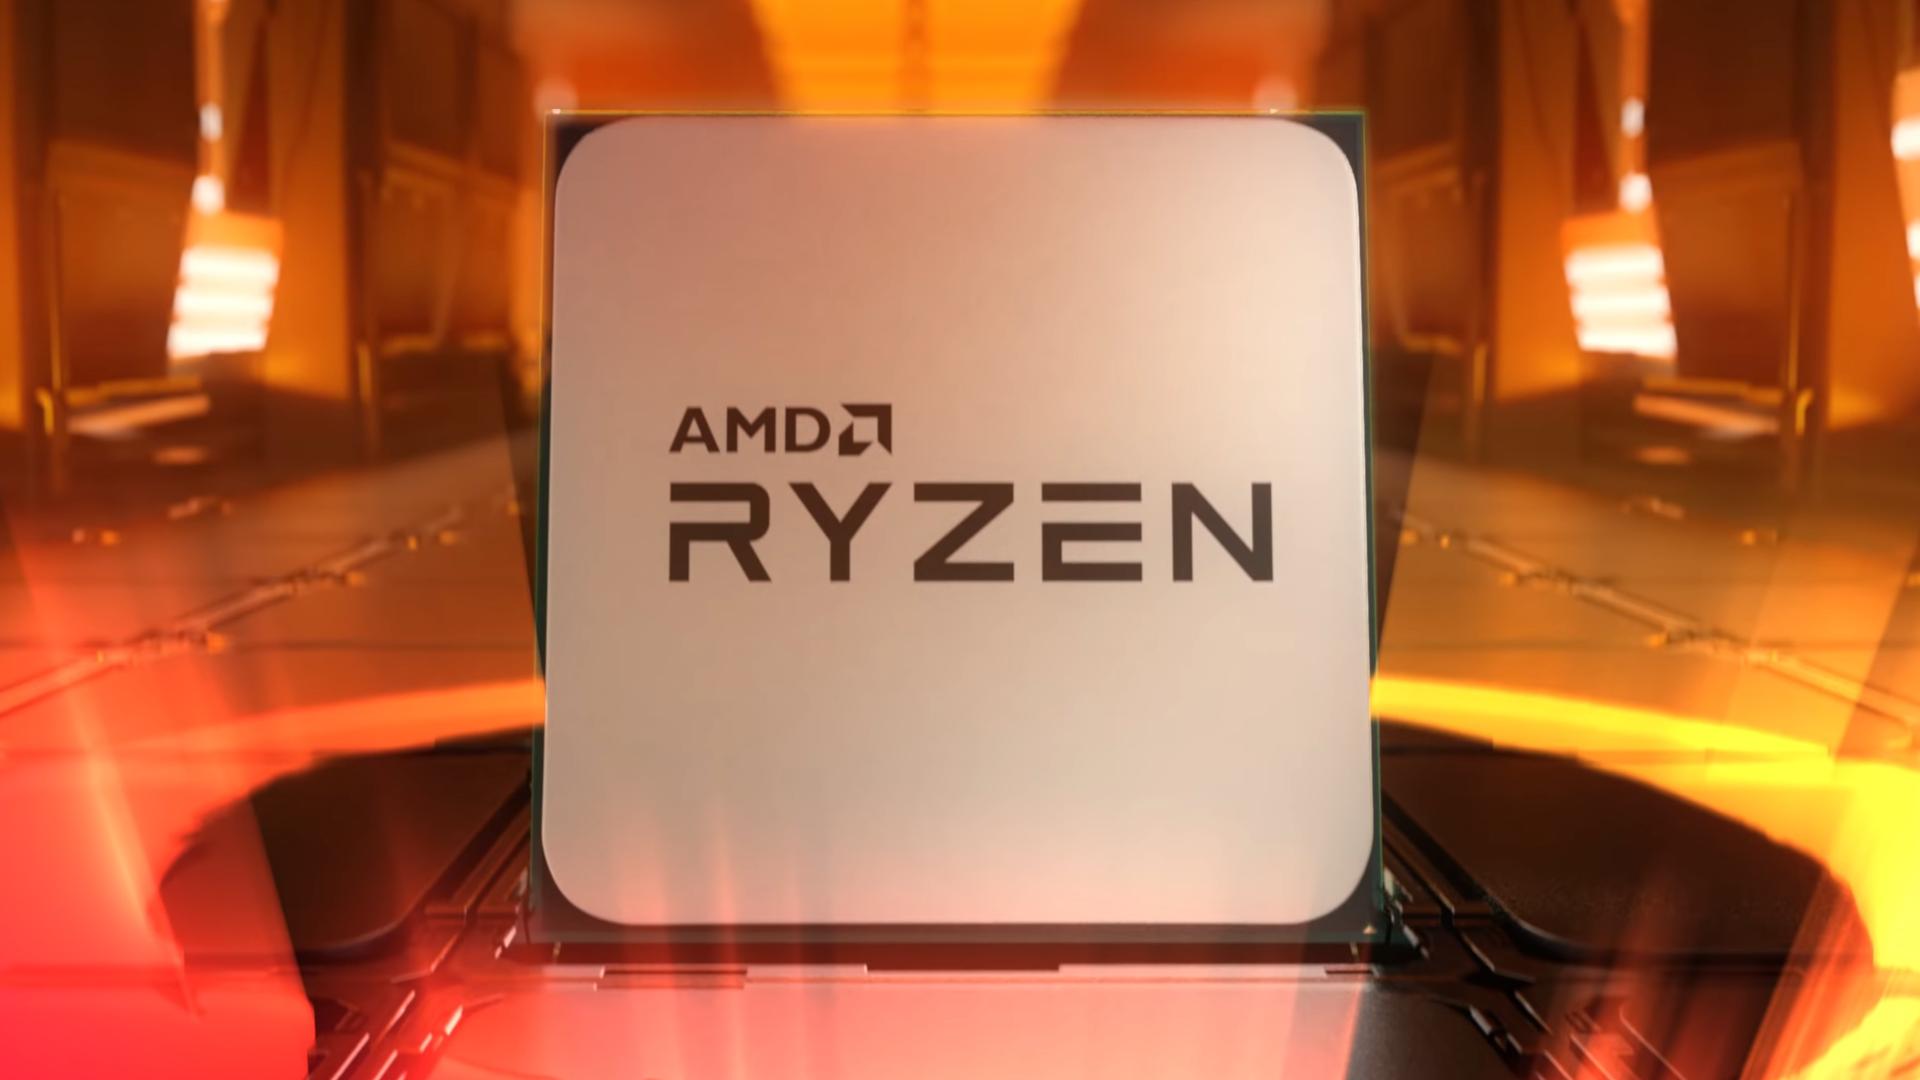 AMD Ryzen 9 3900X im Preisverfall: Spitzenprozessor so günstig wie noch nie